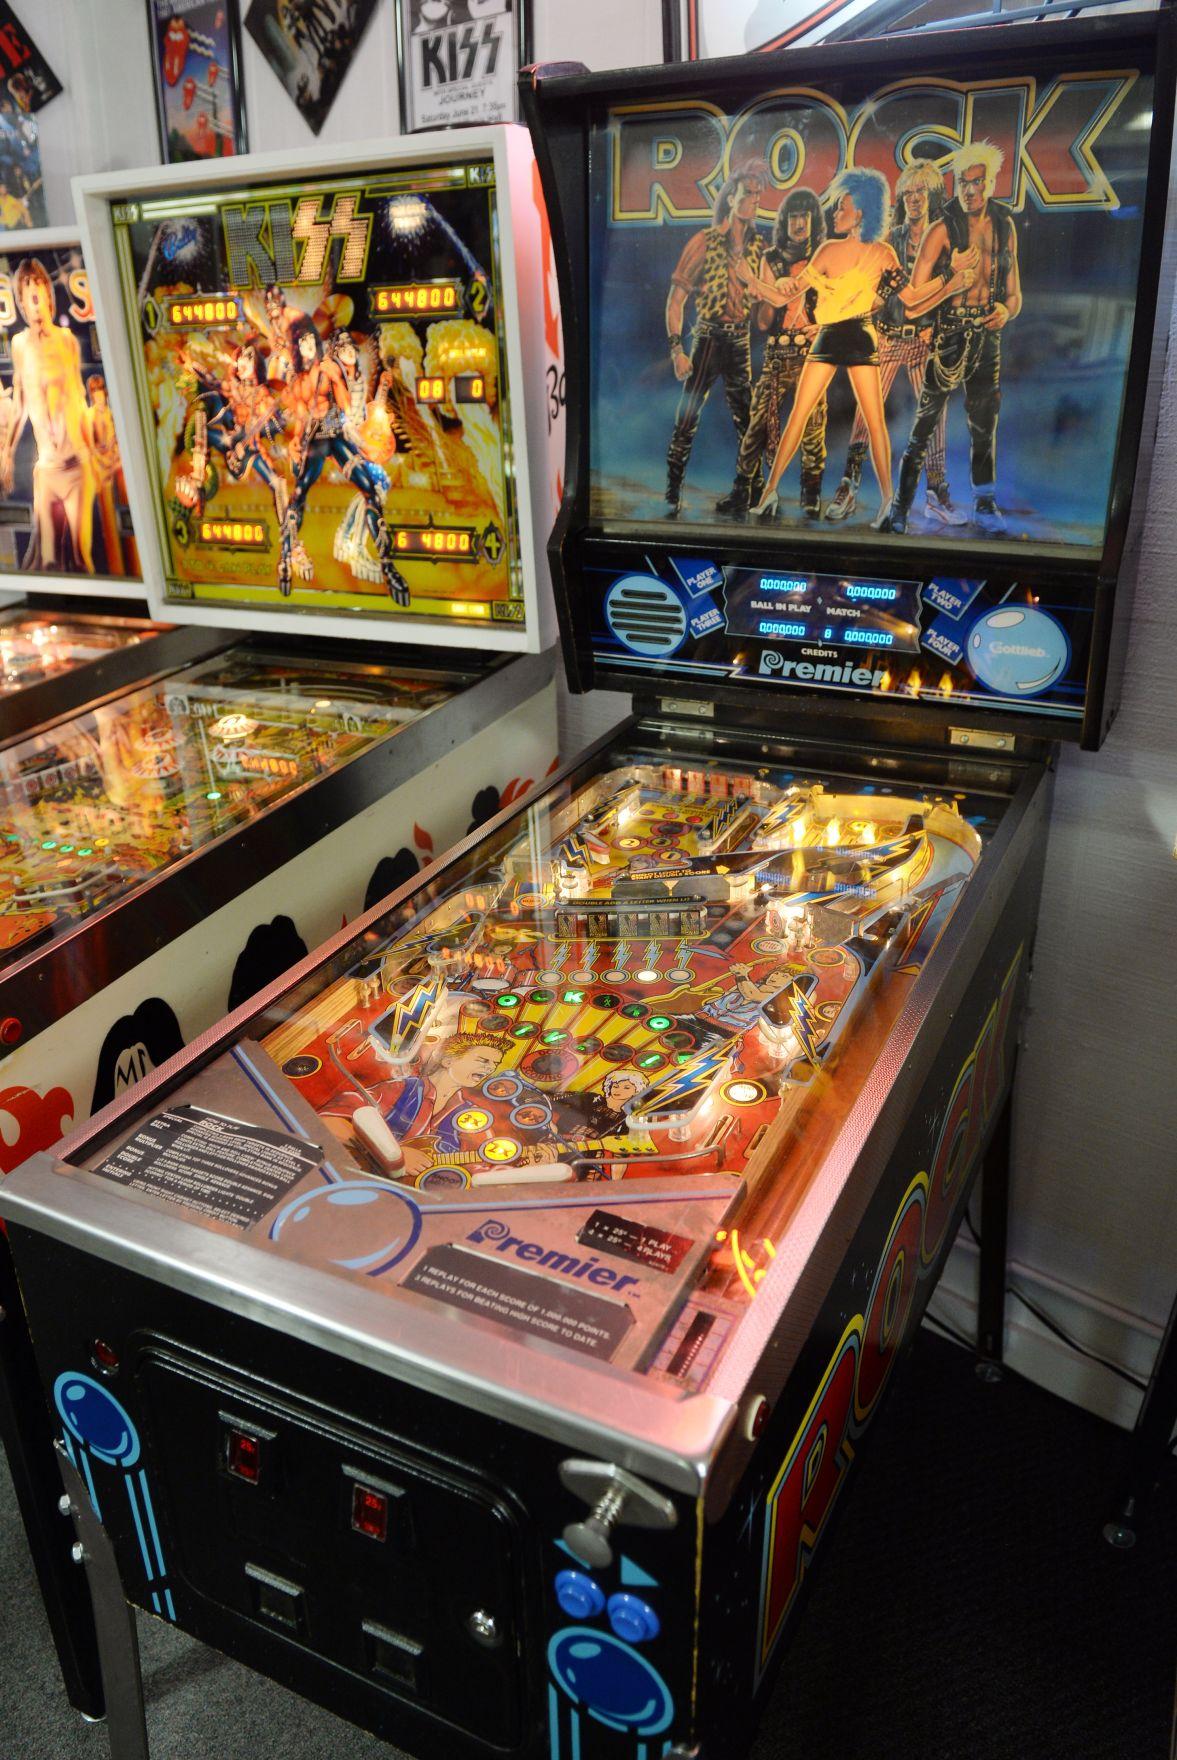 Blast from the past: Arcade a nostalgic dream for Vienna man